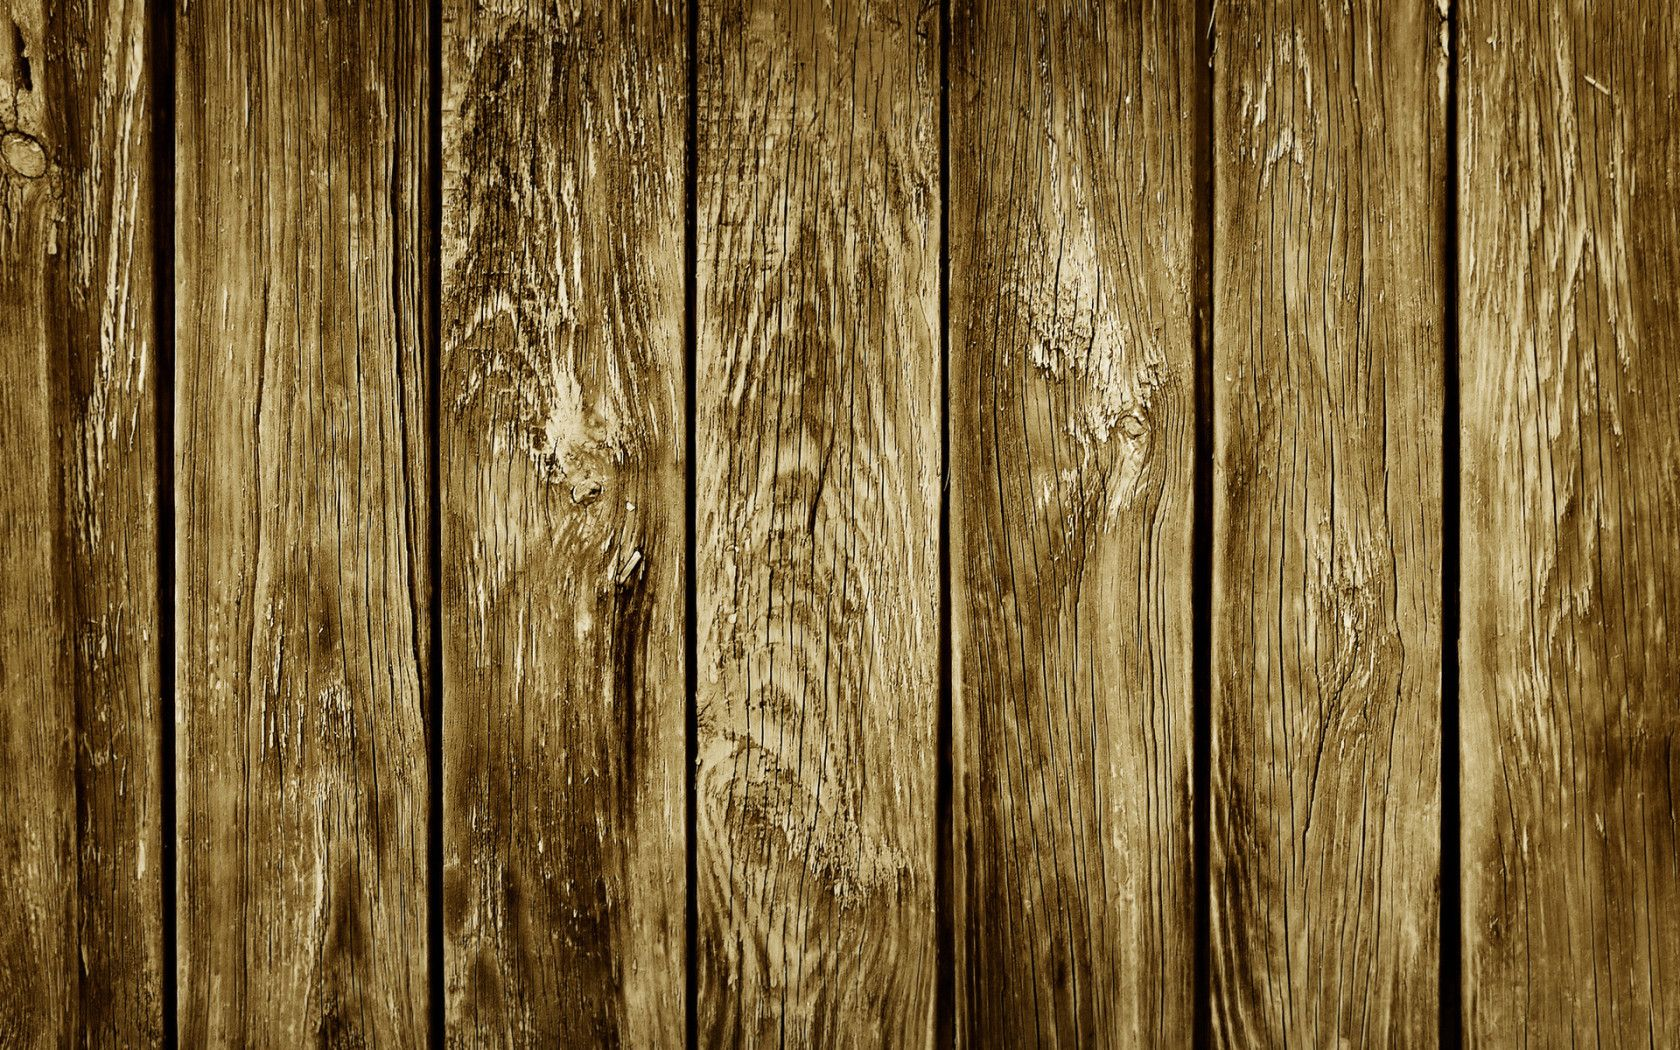 creative wallpaper wood textures | bikes | pinterest | wallpaper